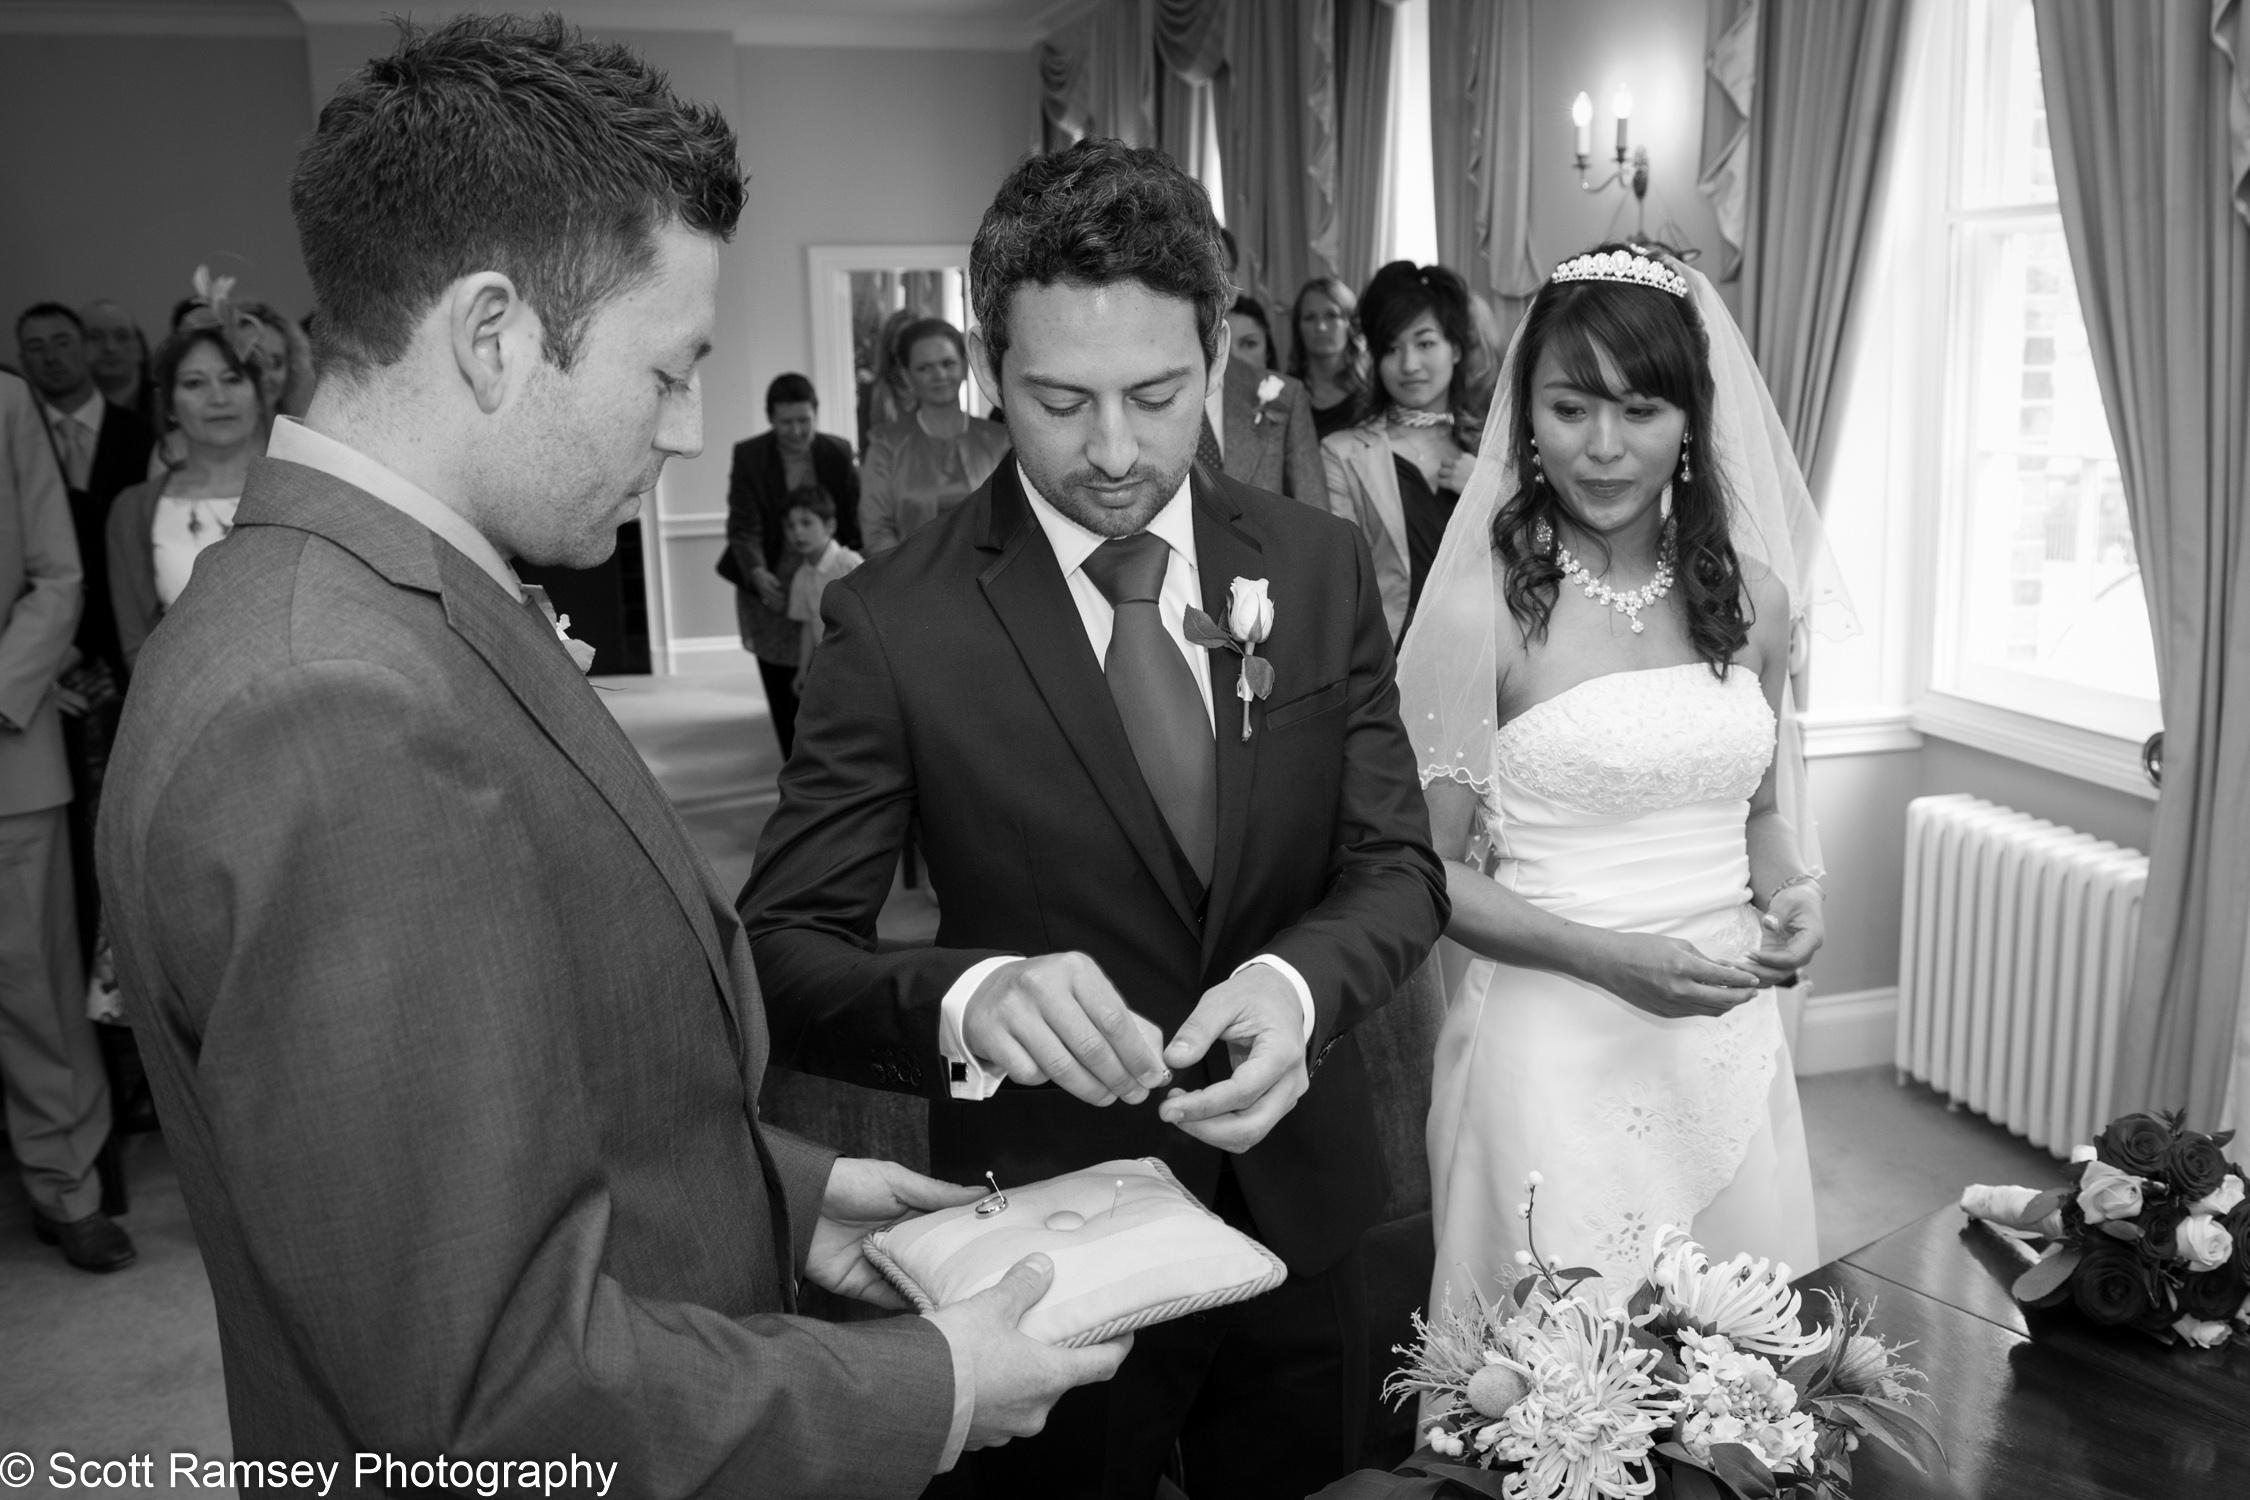 Portsmouth Registry Office Wedding Wedding Rings 040513-13